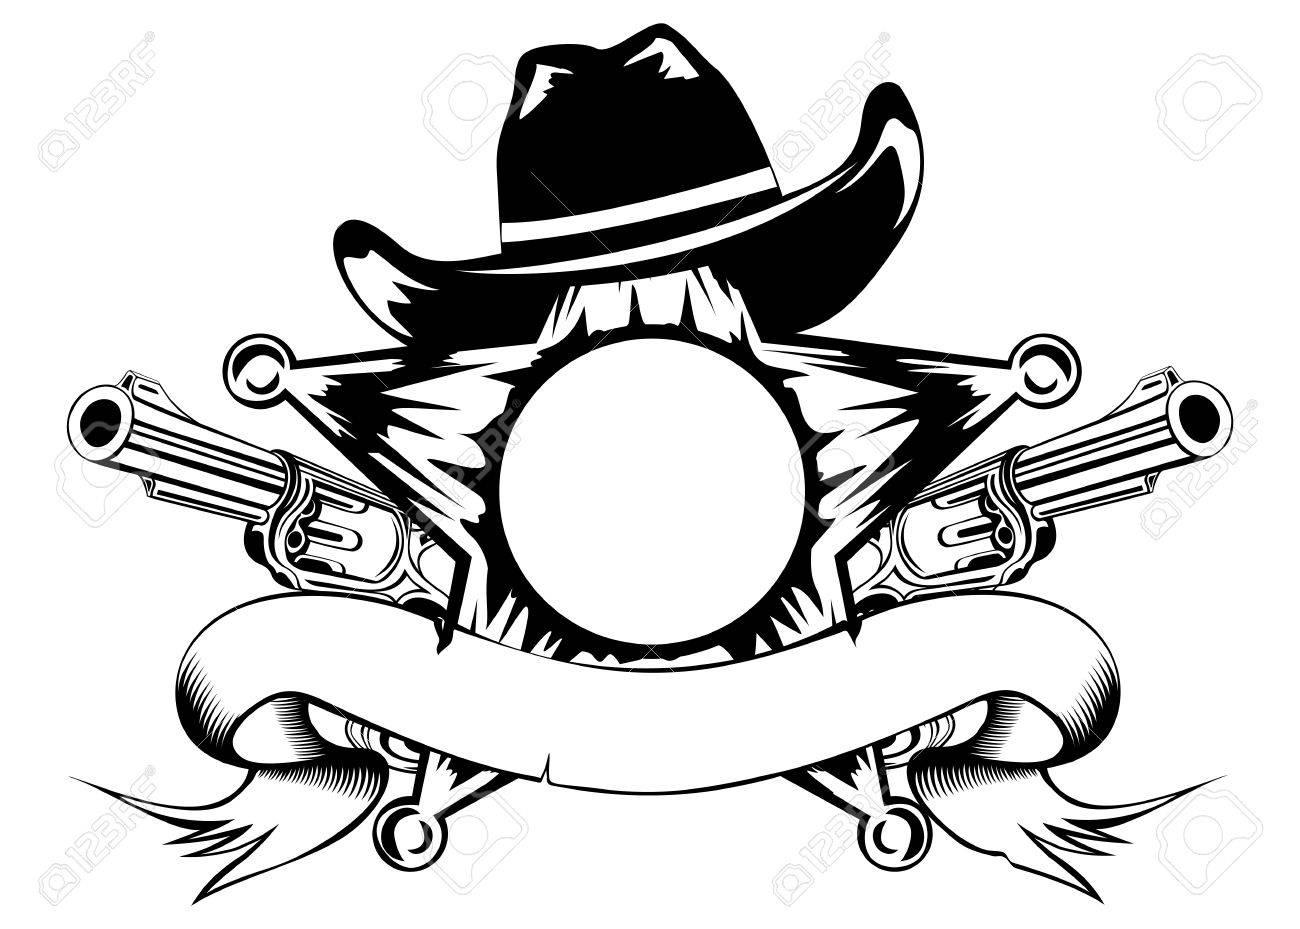 18,147 Handgun Stock Vector Illustration And Royalty Free Handgun ...